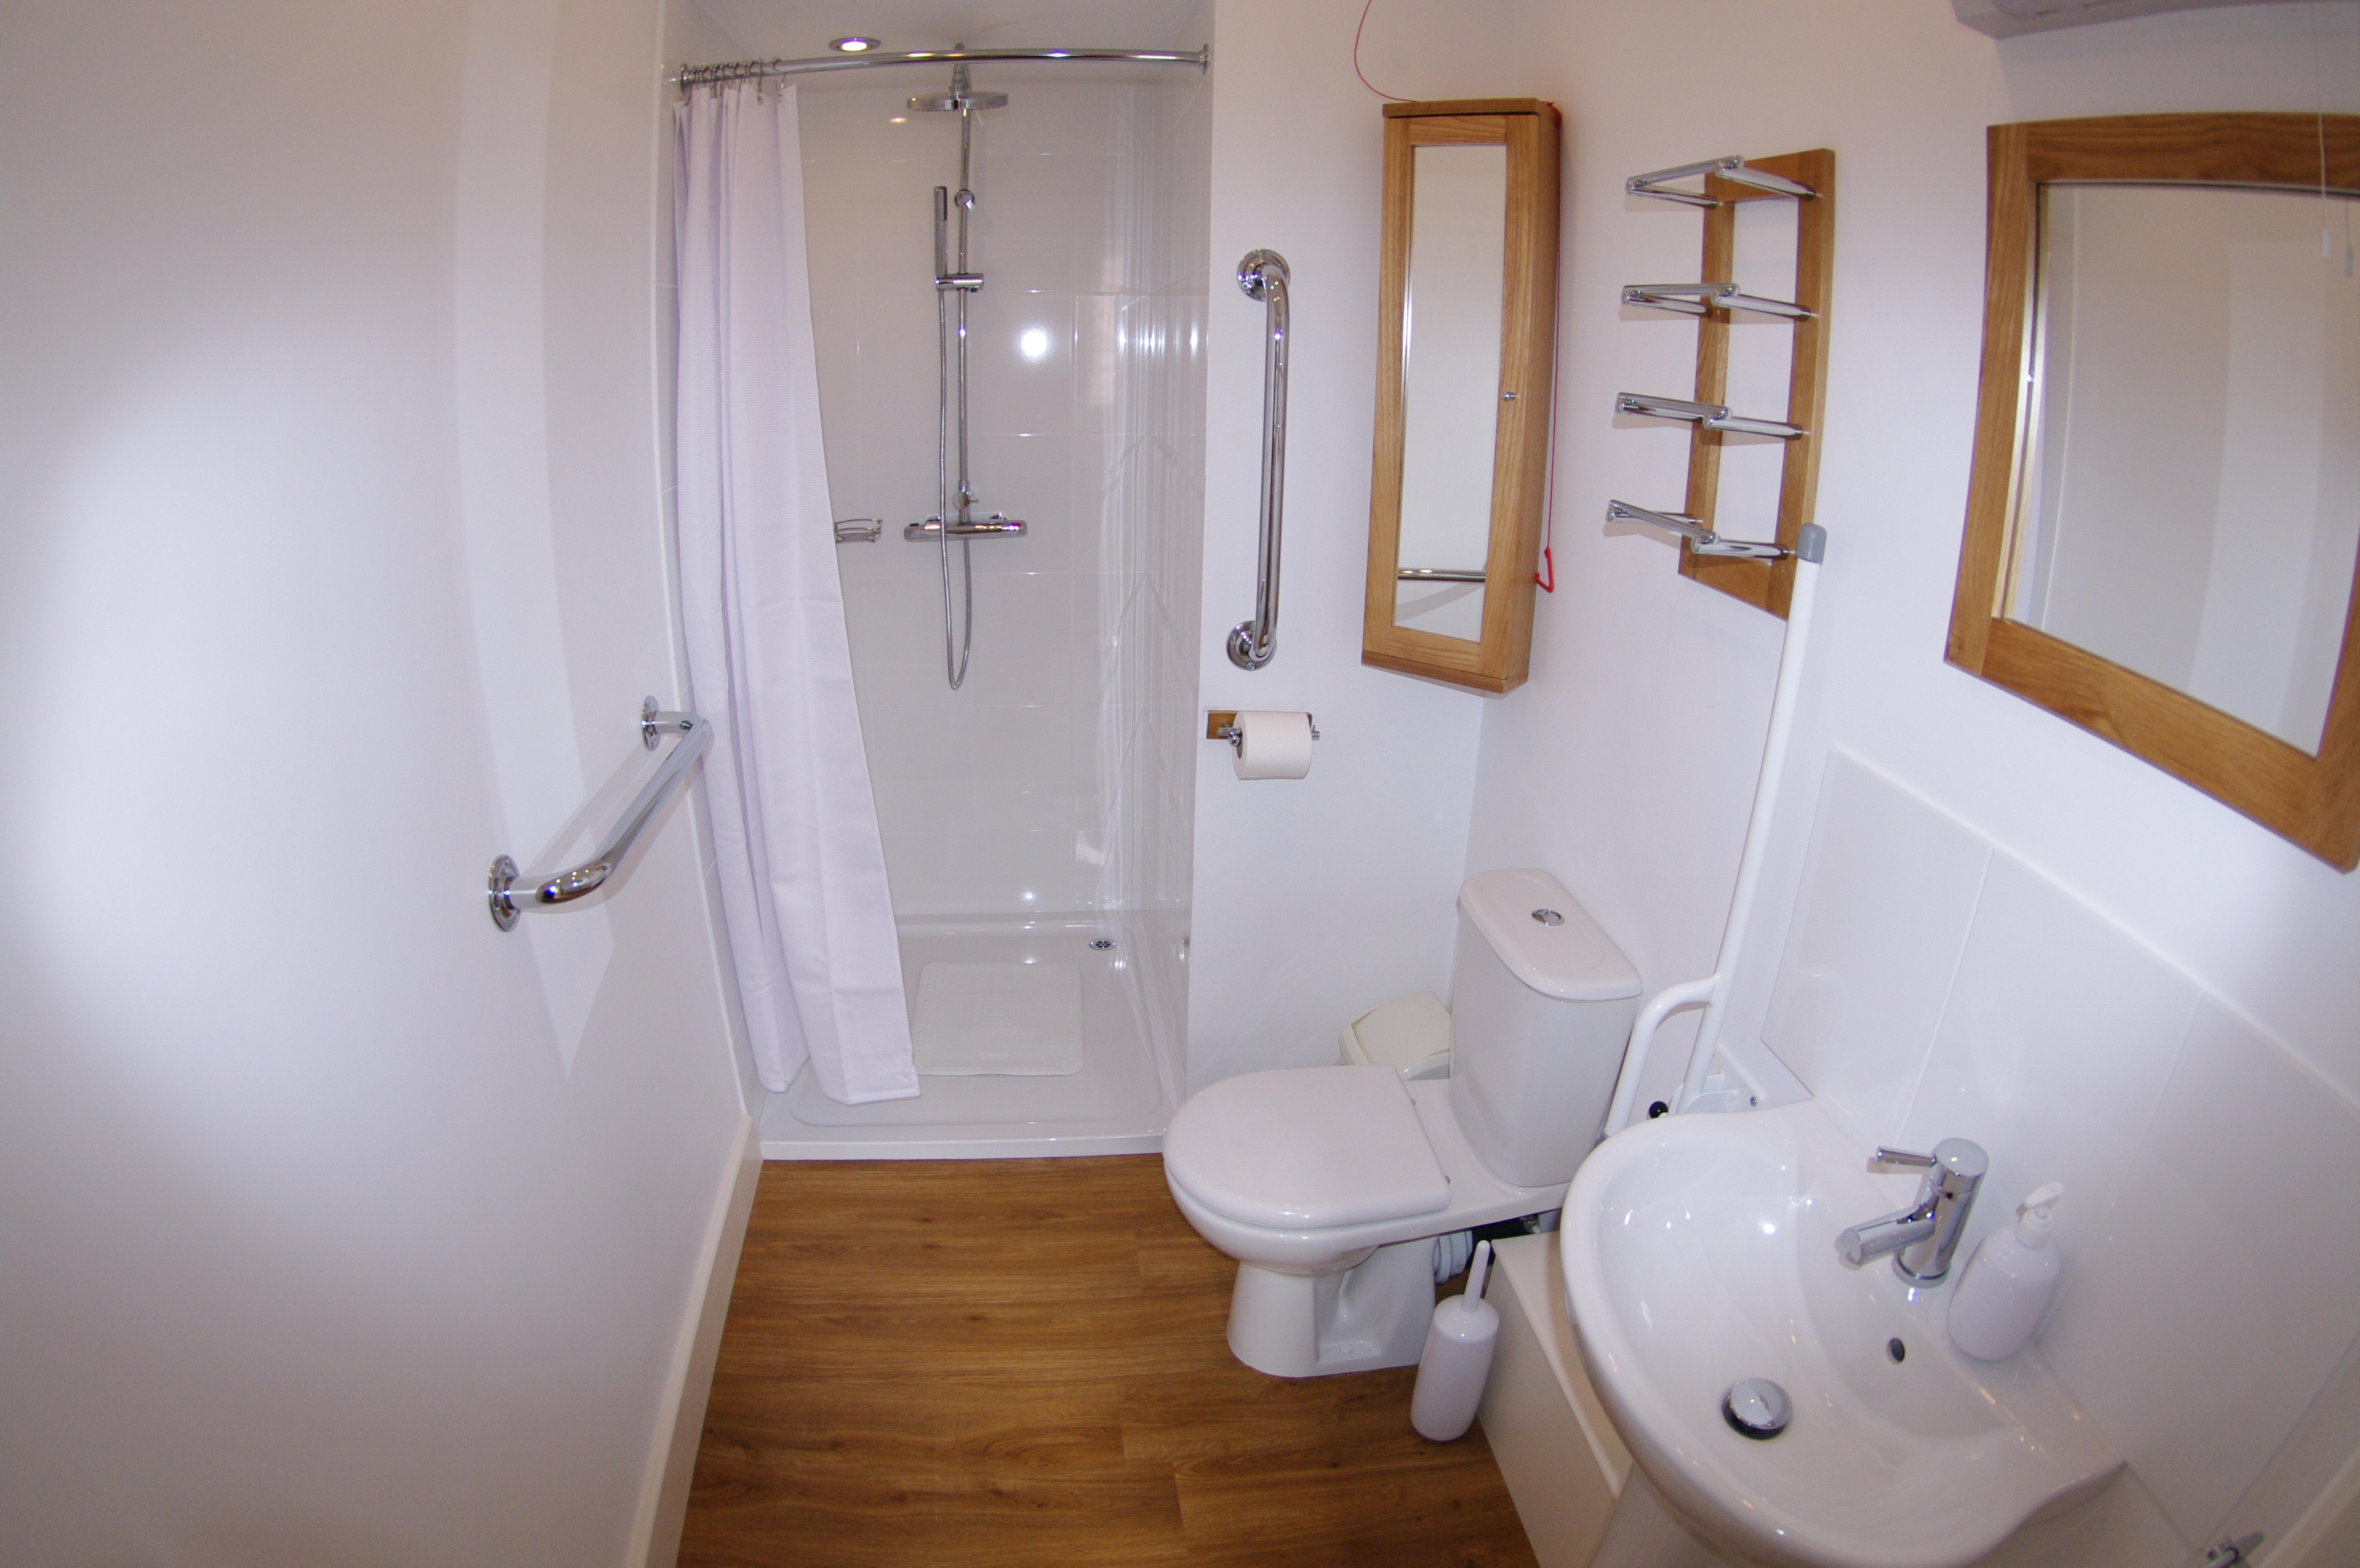 Stairs lead to the first floor bedroom bathroom and en suite bedroom